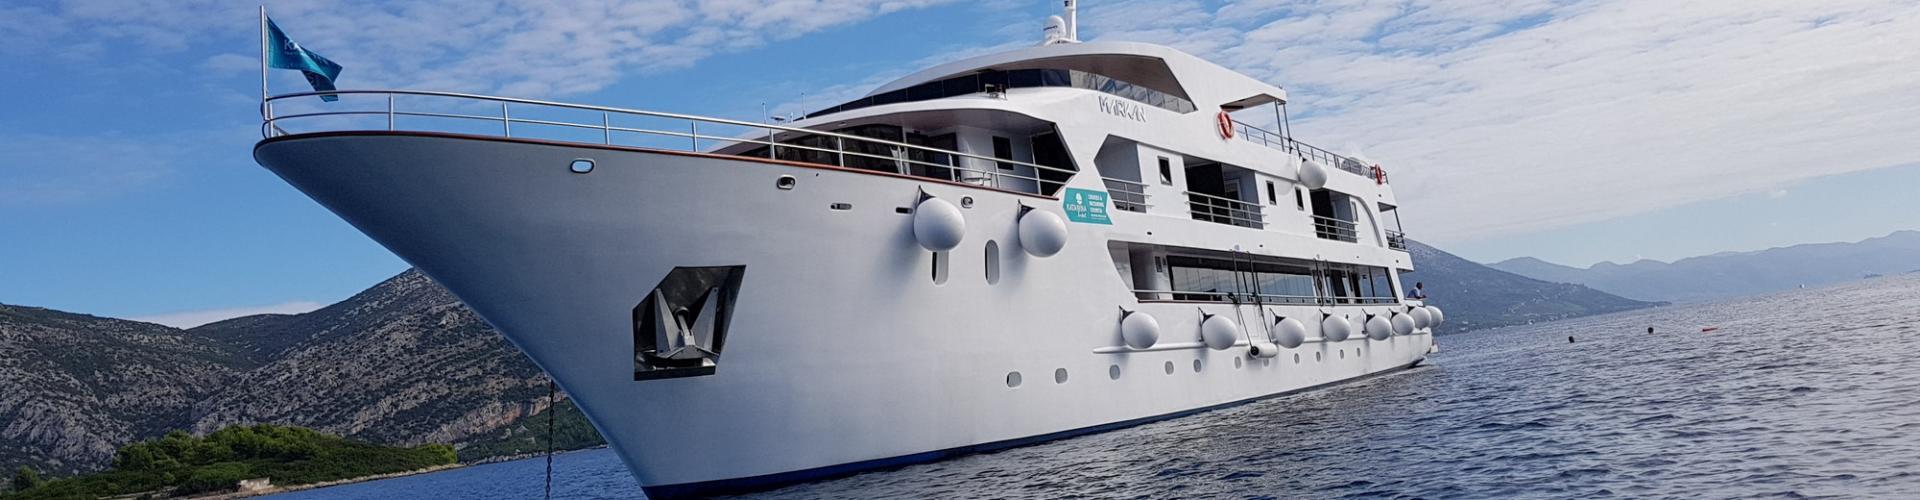 Deluxe Superior cruiser MV Markan- motor yacht